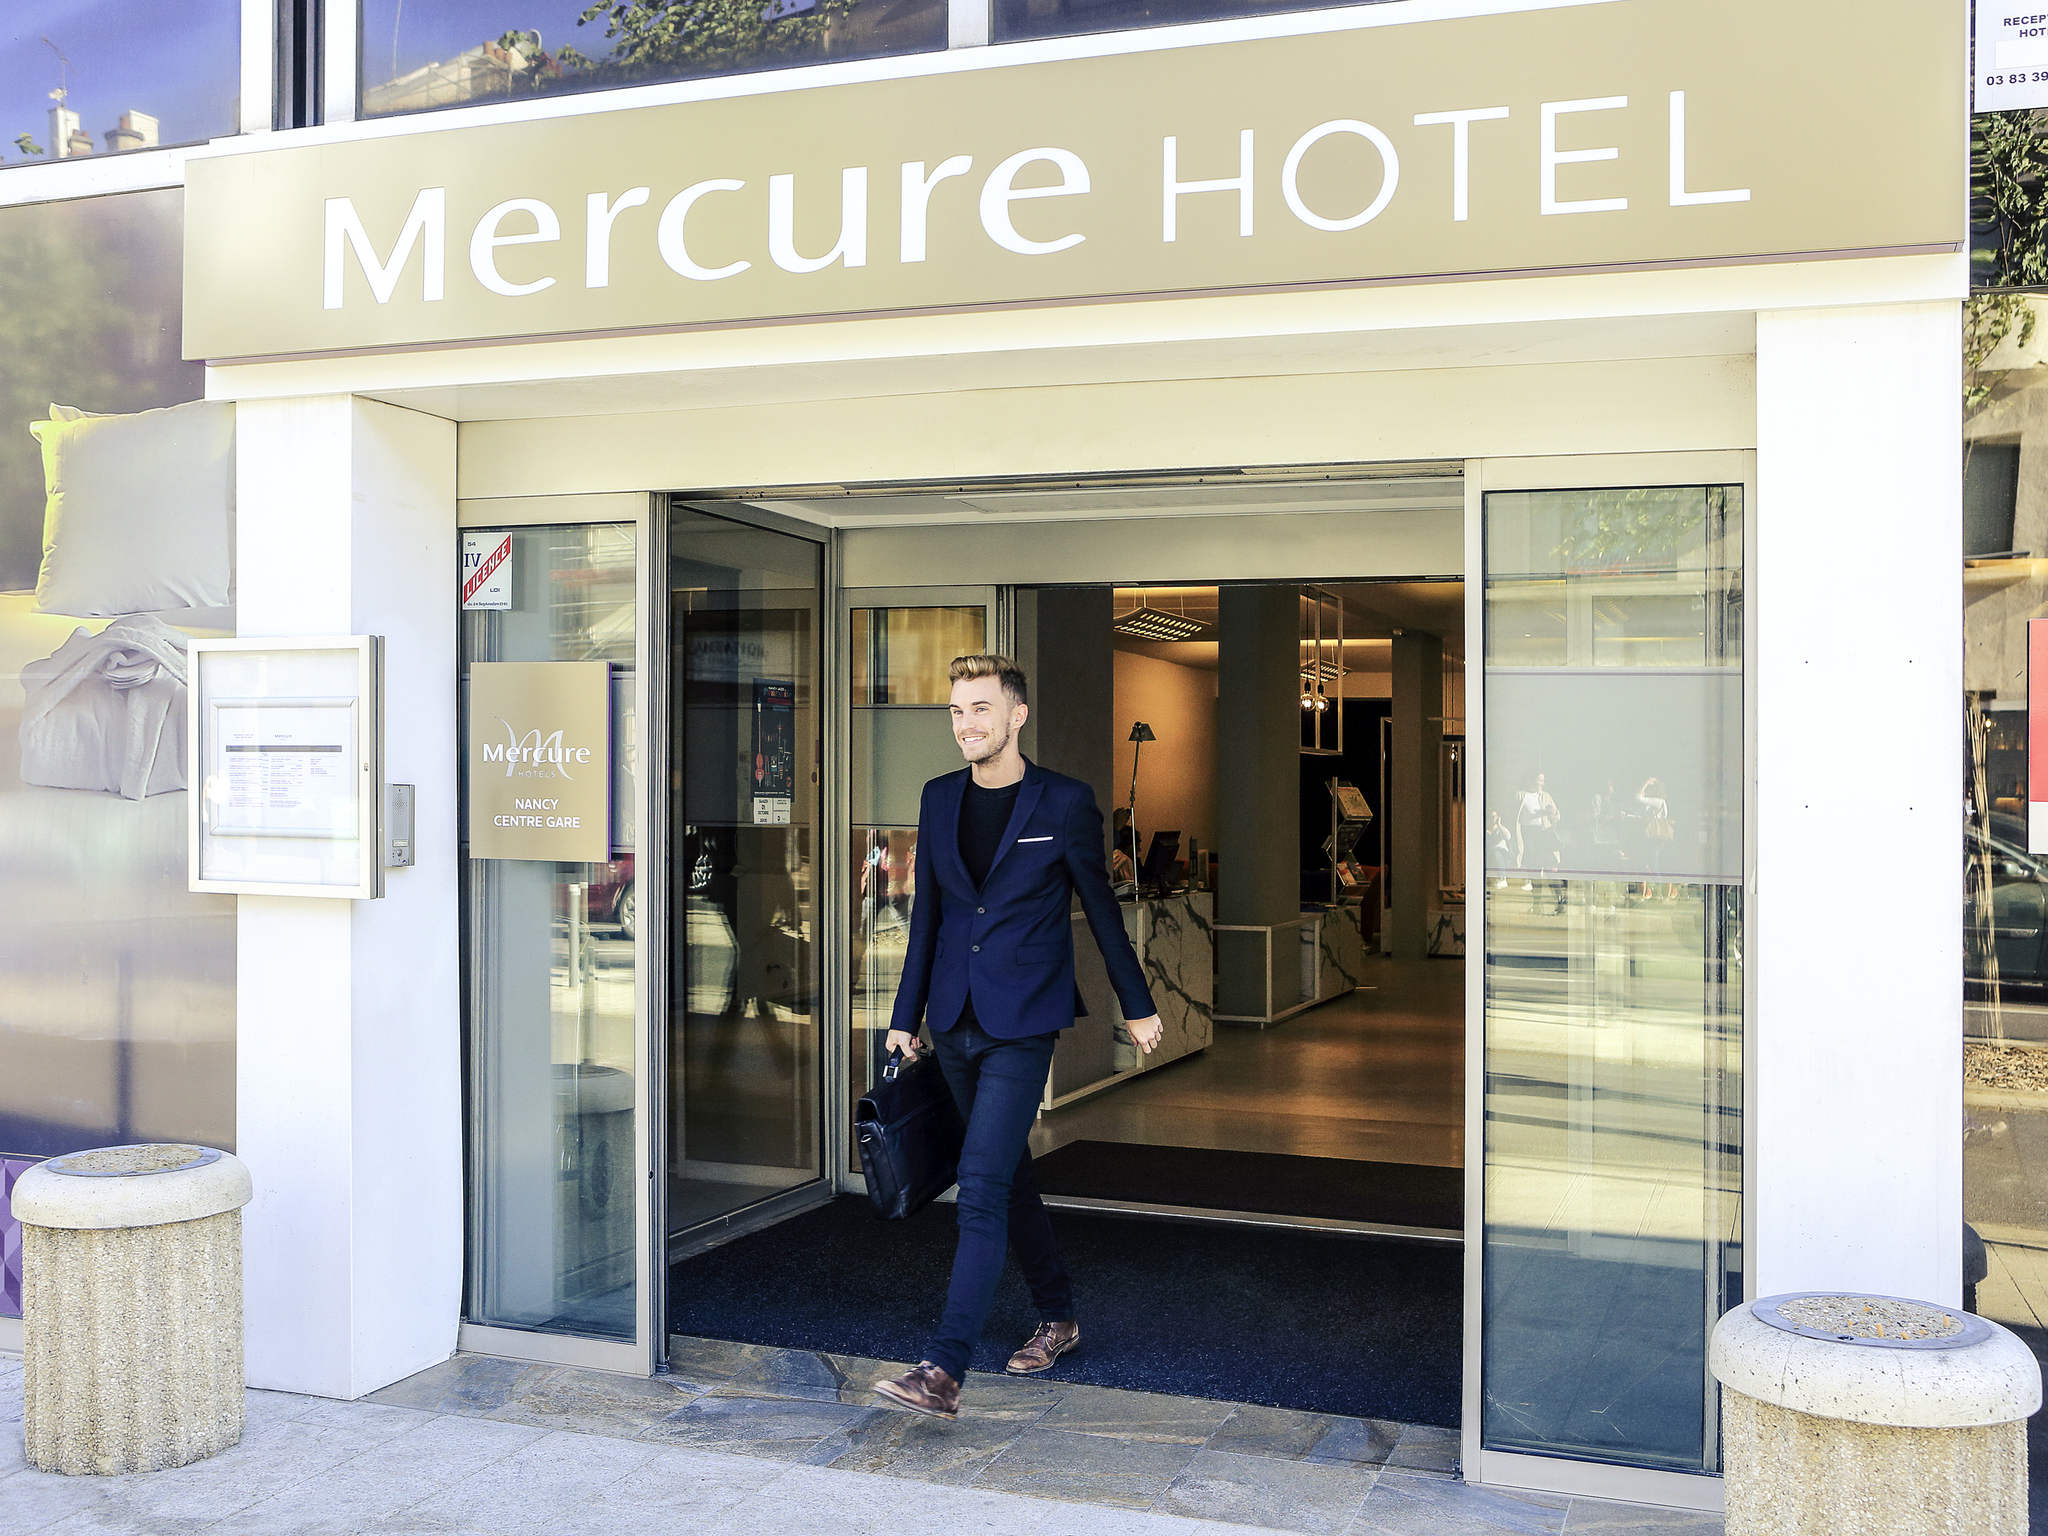 Hotel - Hôtel Mercure Nancy Centre Gare